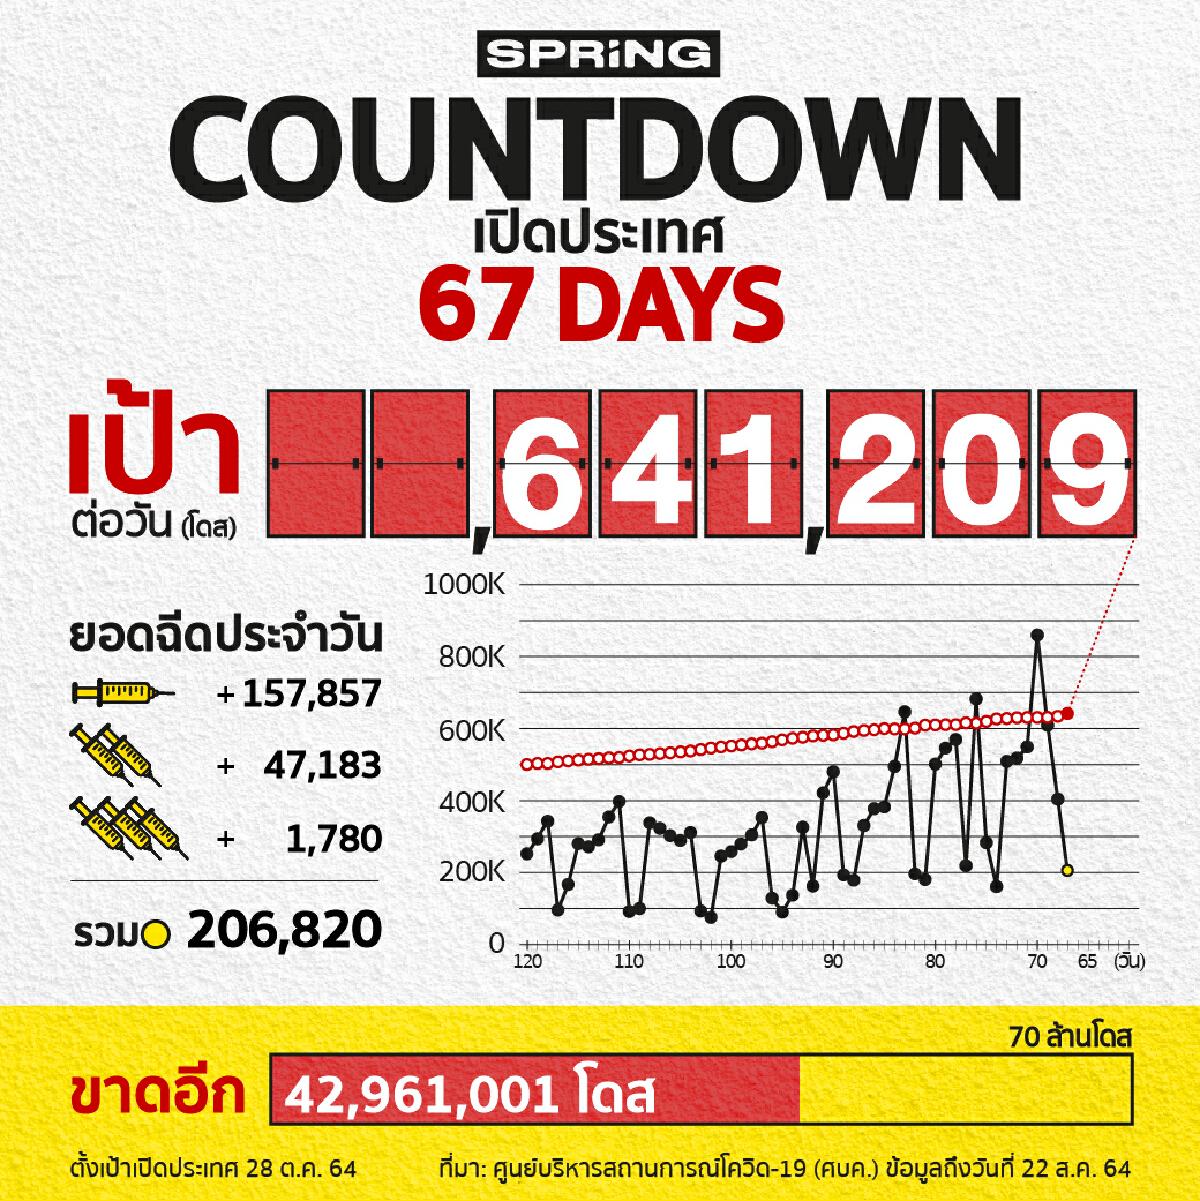 COUNTDOWN! เปิดประเทศใน 67 วัน ฉีดวัคซีนโควิด 206,820 โดส